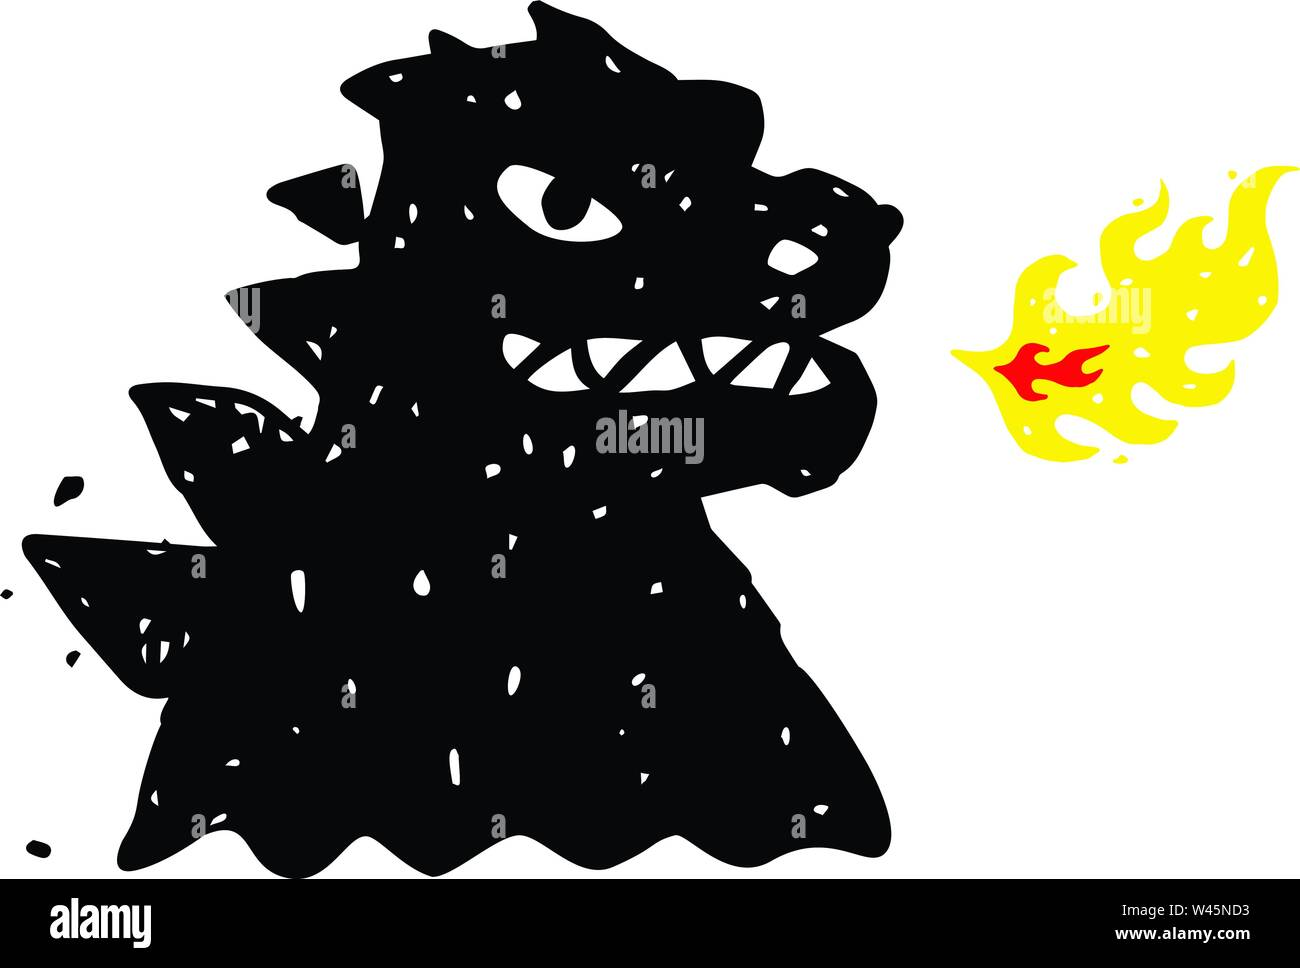 Logo, illustration of godzilla, dragon. Vector flat logo. Image is isolated on white background. Sign, mascot of the company. Corporate identity. Fire - Stock Image